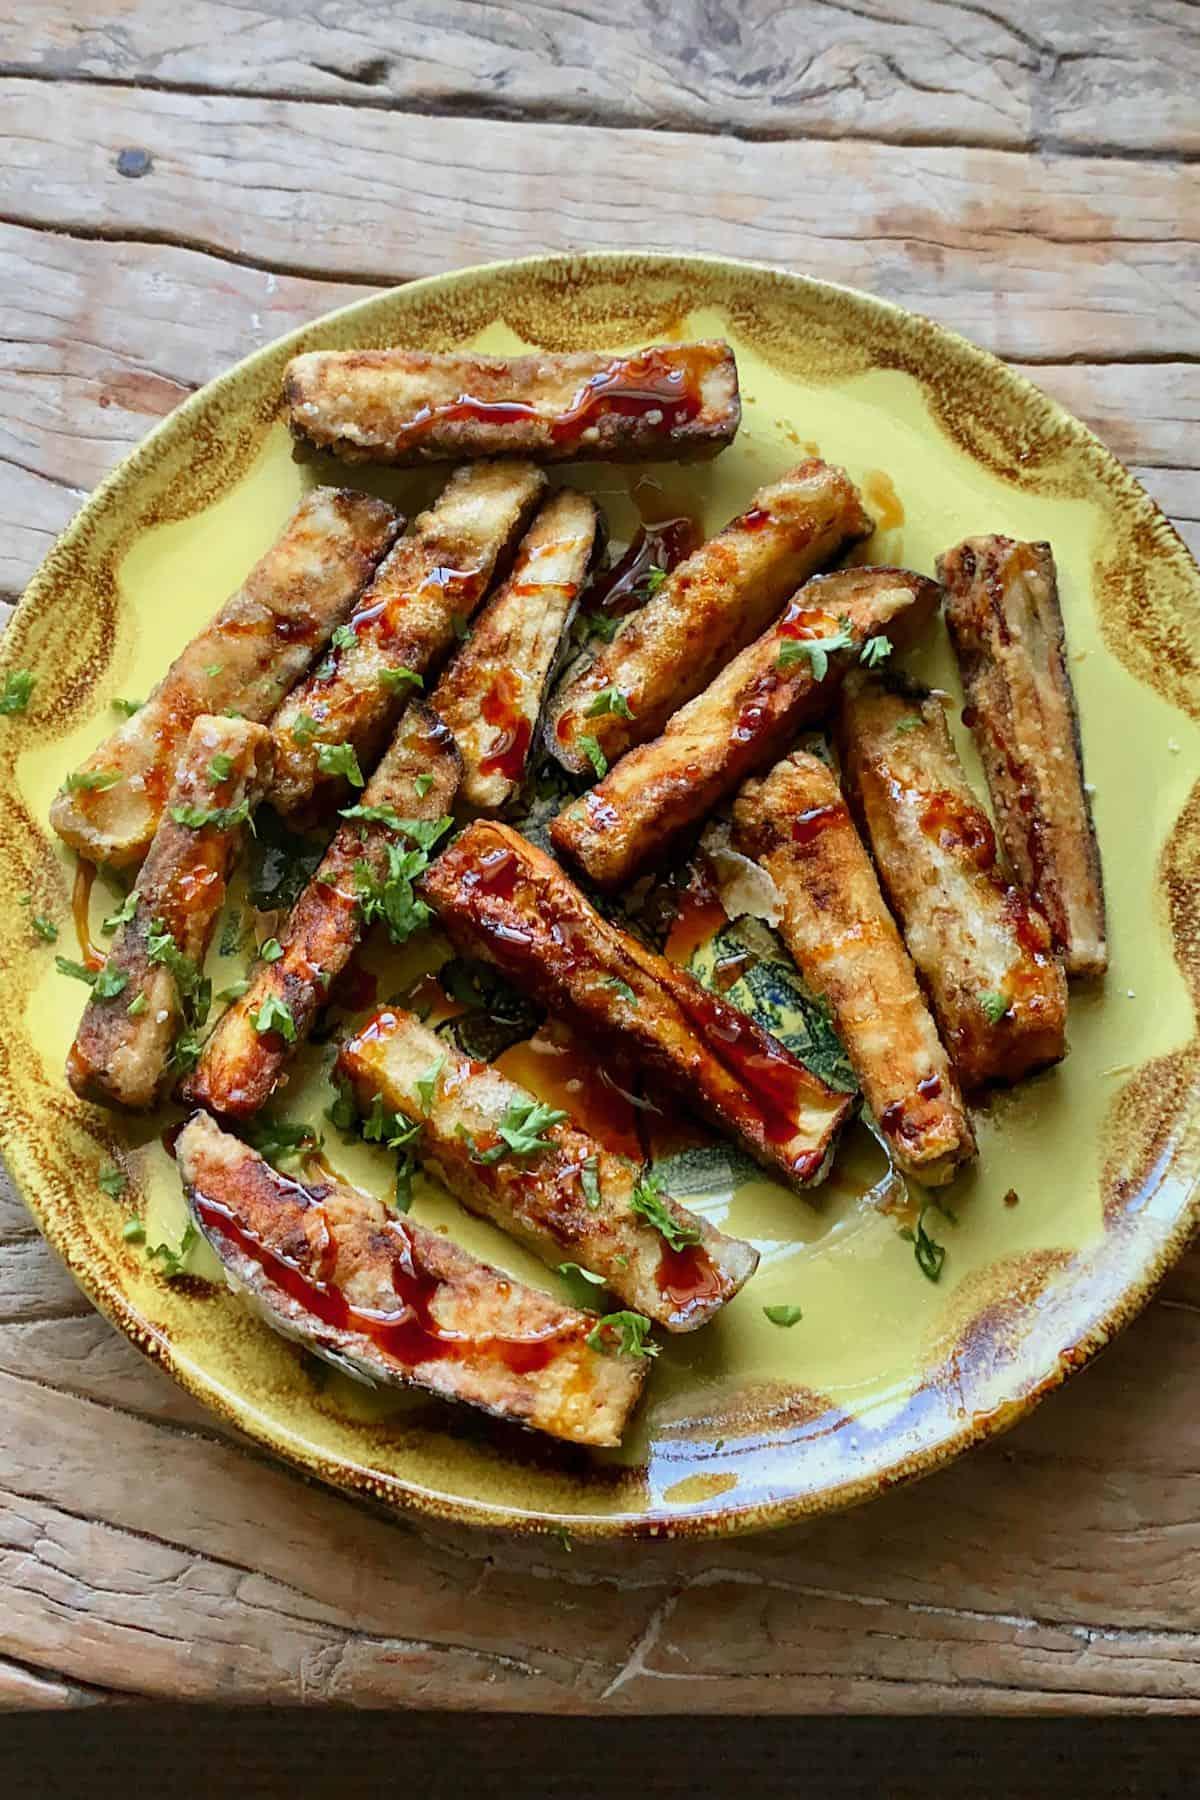 Eggplant fries on a plate